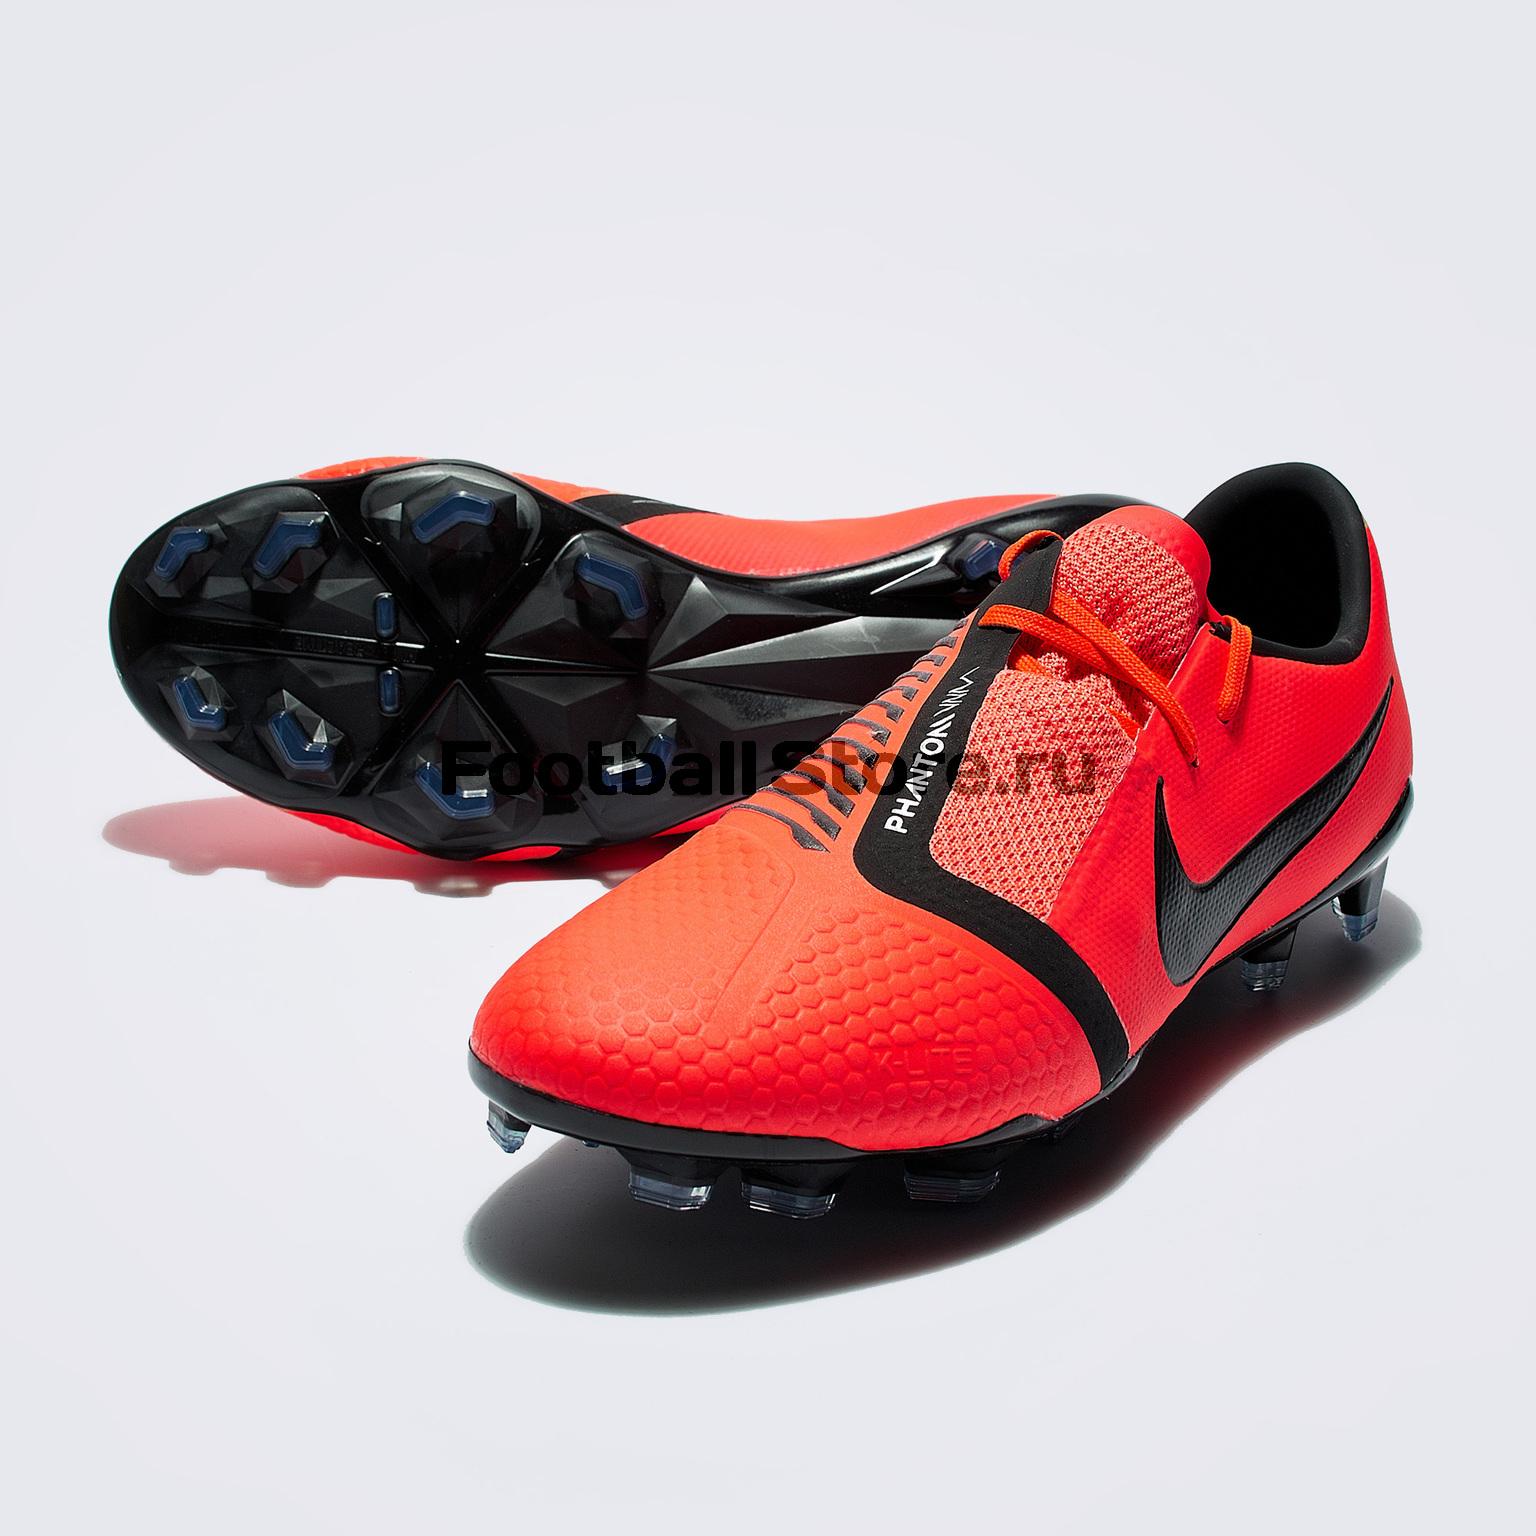 Бутсы Nike Phantom Venom Pro FG AO8738-600 бутсы nike mercurial victory iii fg 509128 800